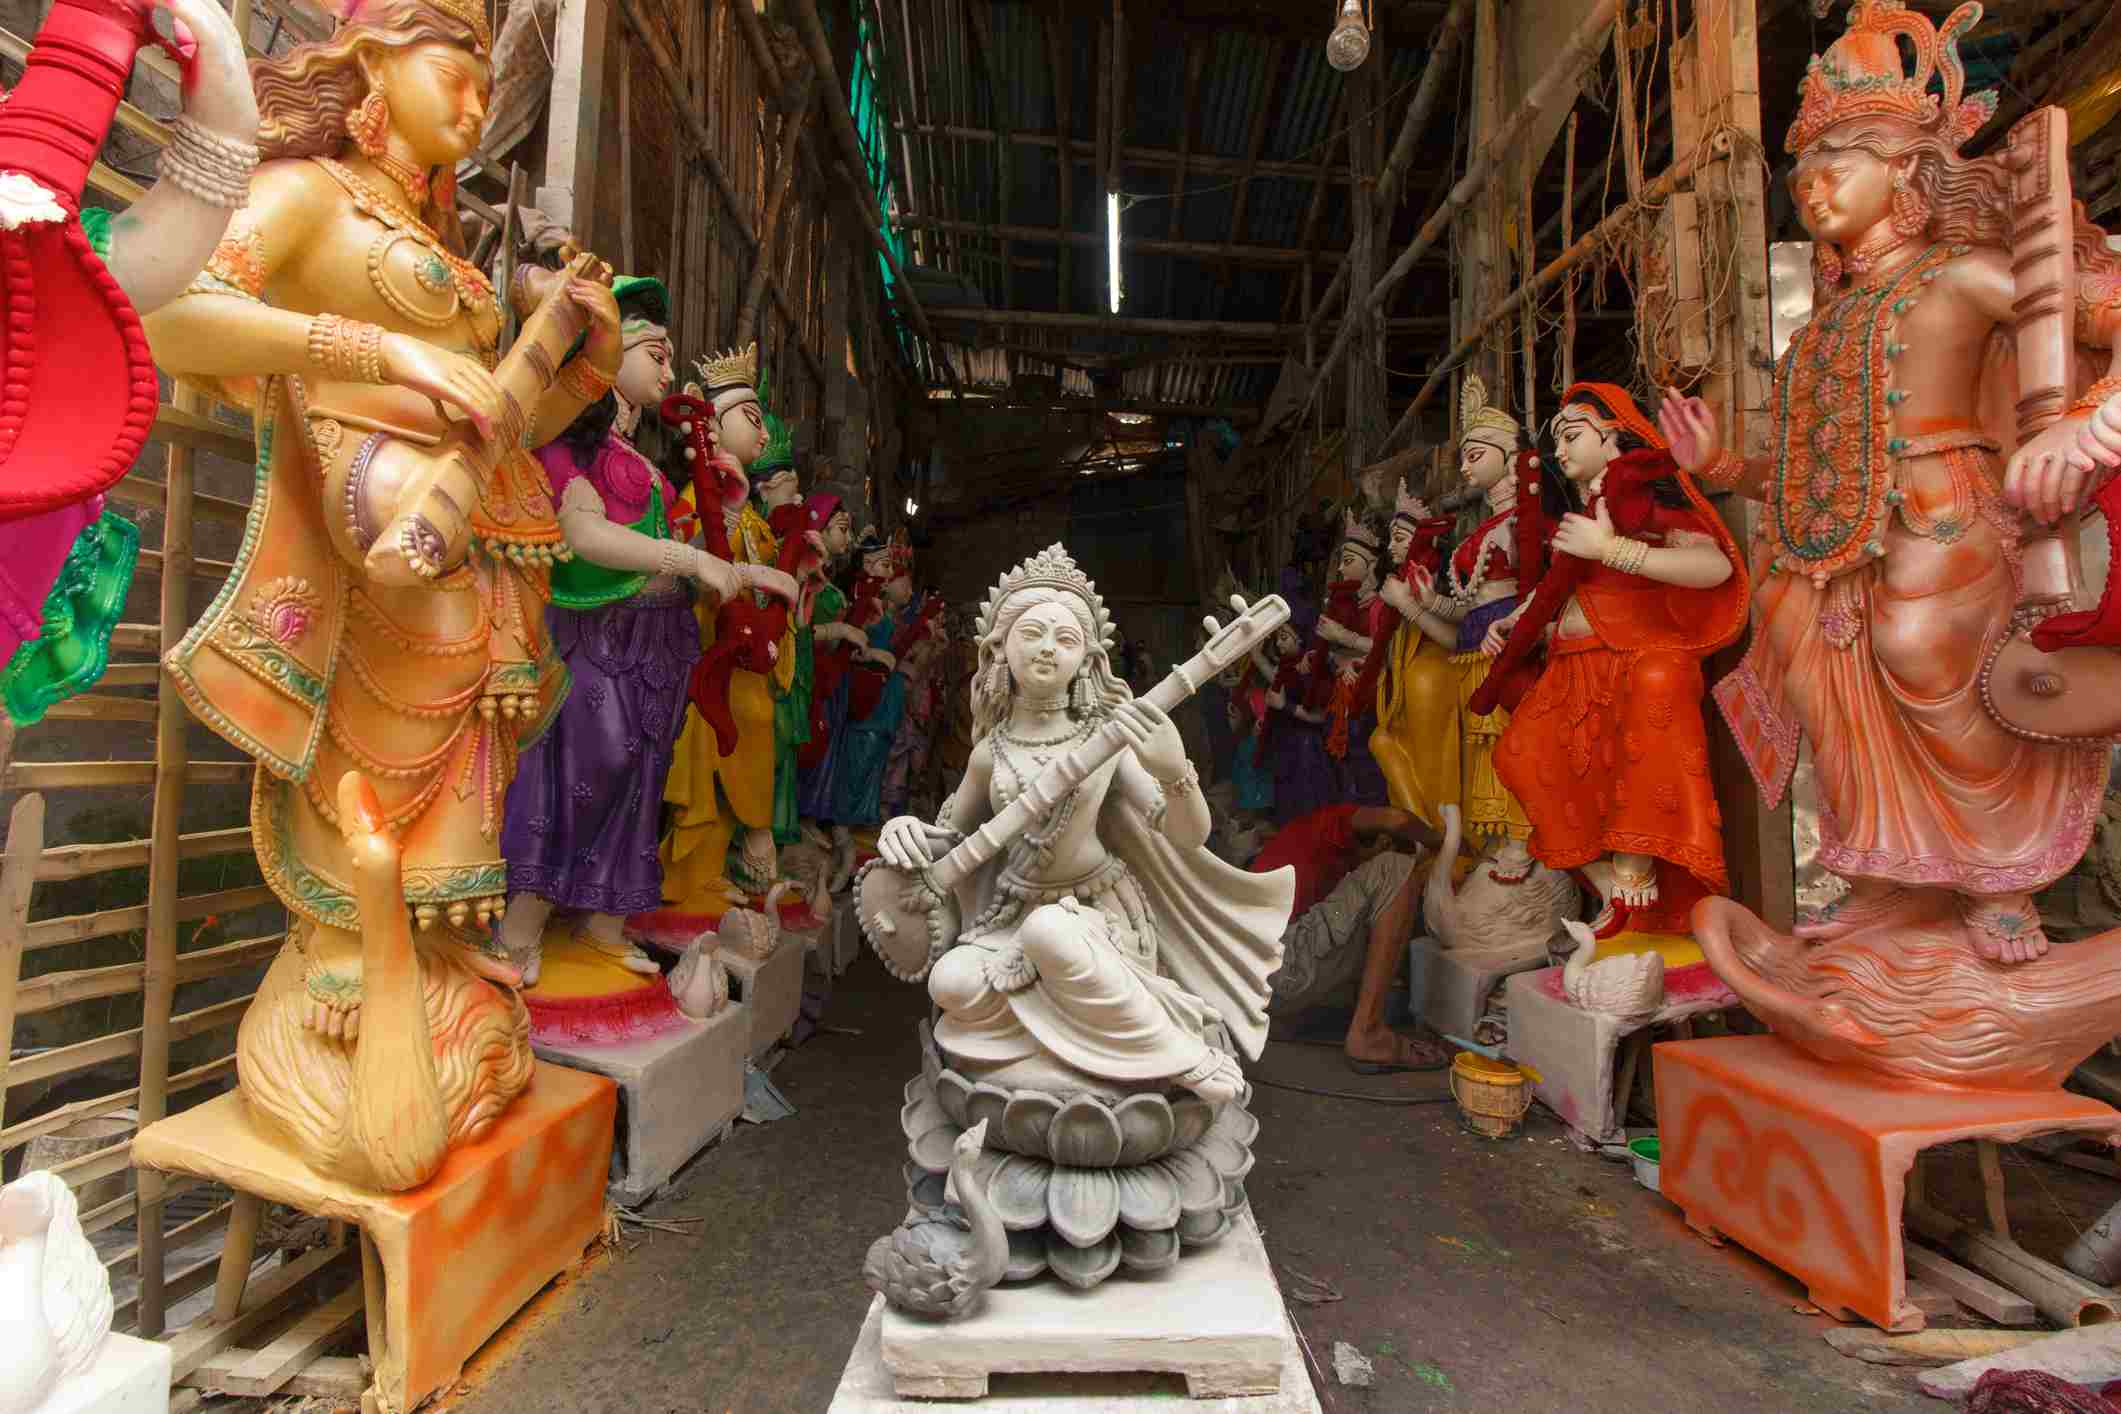 Beauty of raw clay sculptures of Hindu goddesses like Saraswati